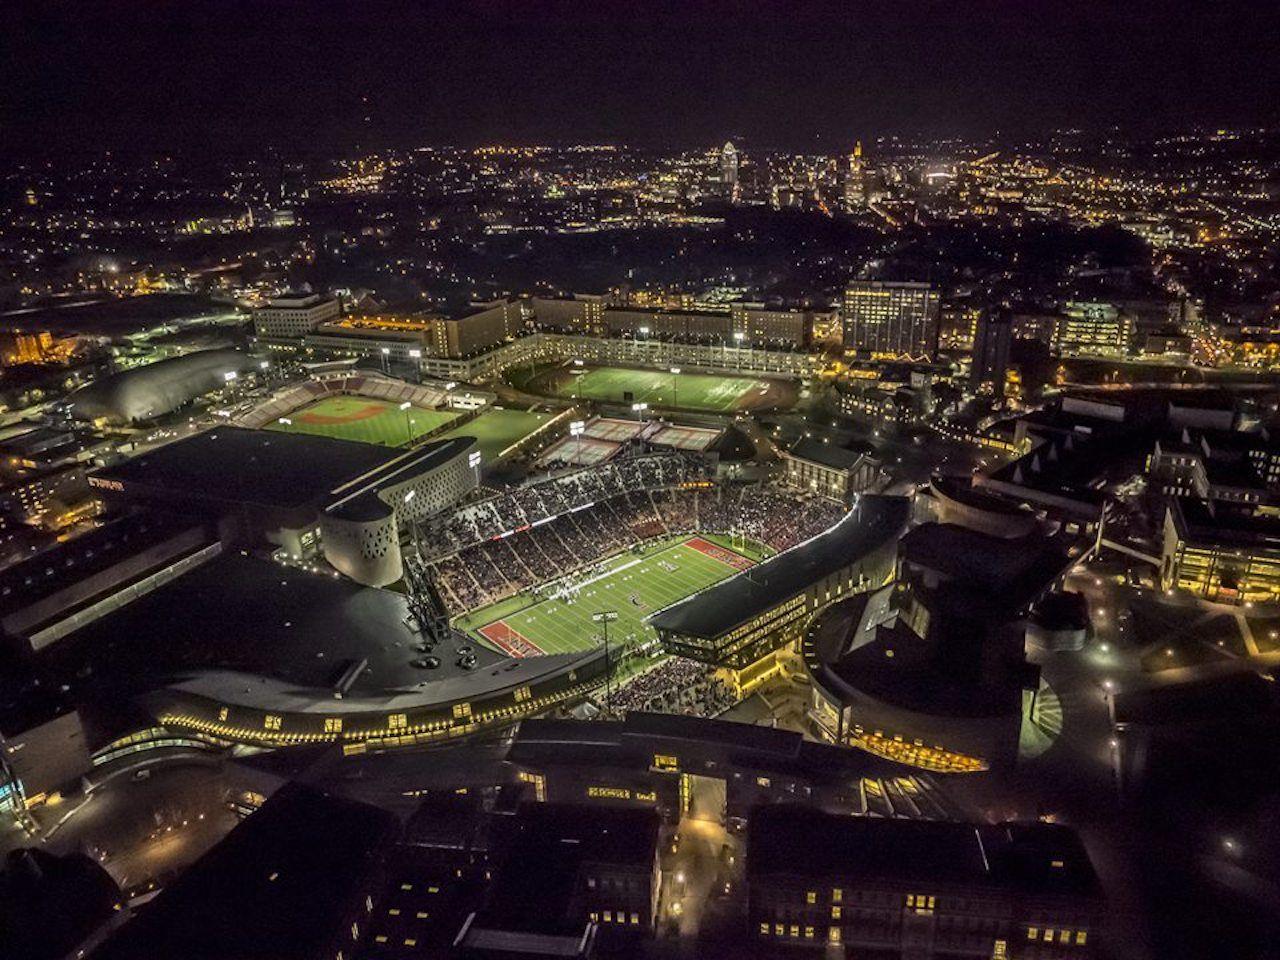 University of Cincinnati football field and cityscape at night